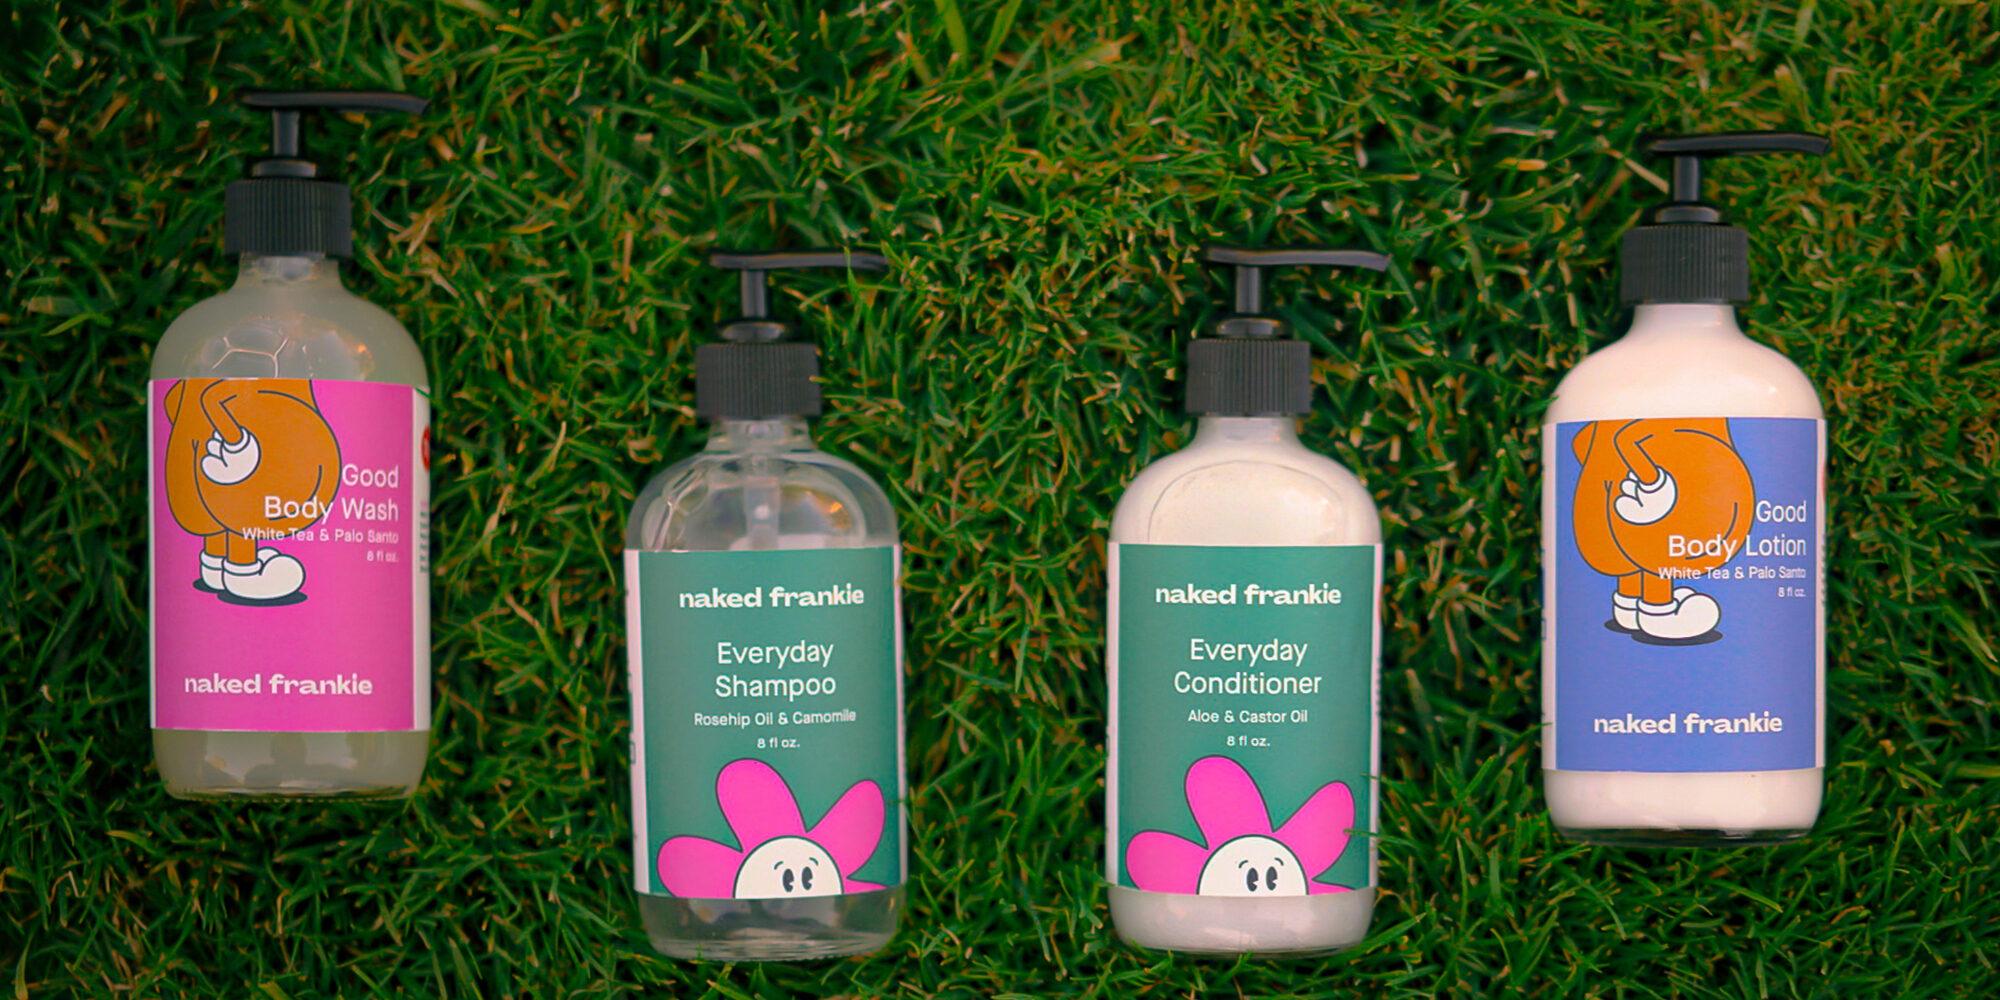 Inspired By Fifties-Era Milkmen, Naked Frankie Brings A Closed-Loop Beauty Retail Model To Los Angeles